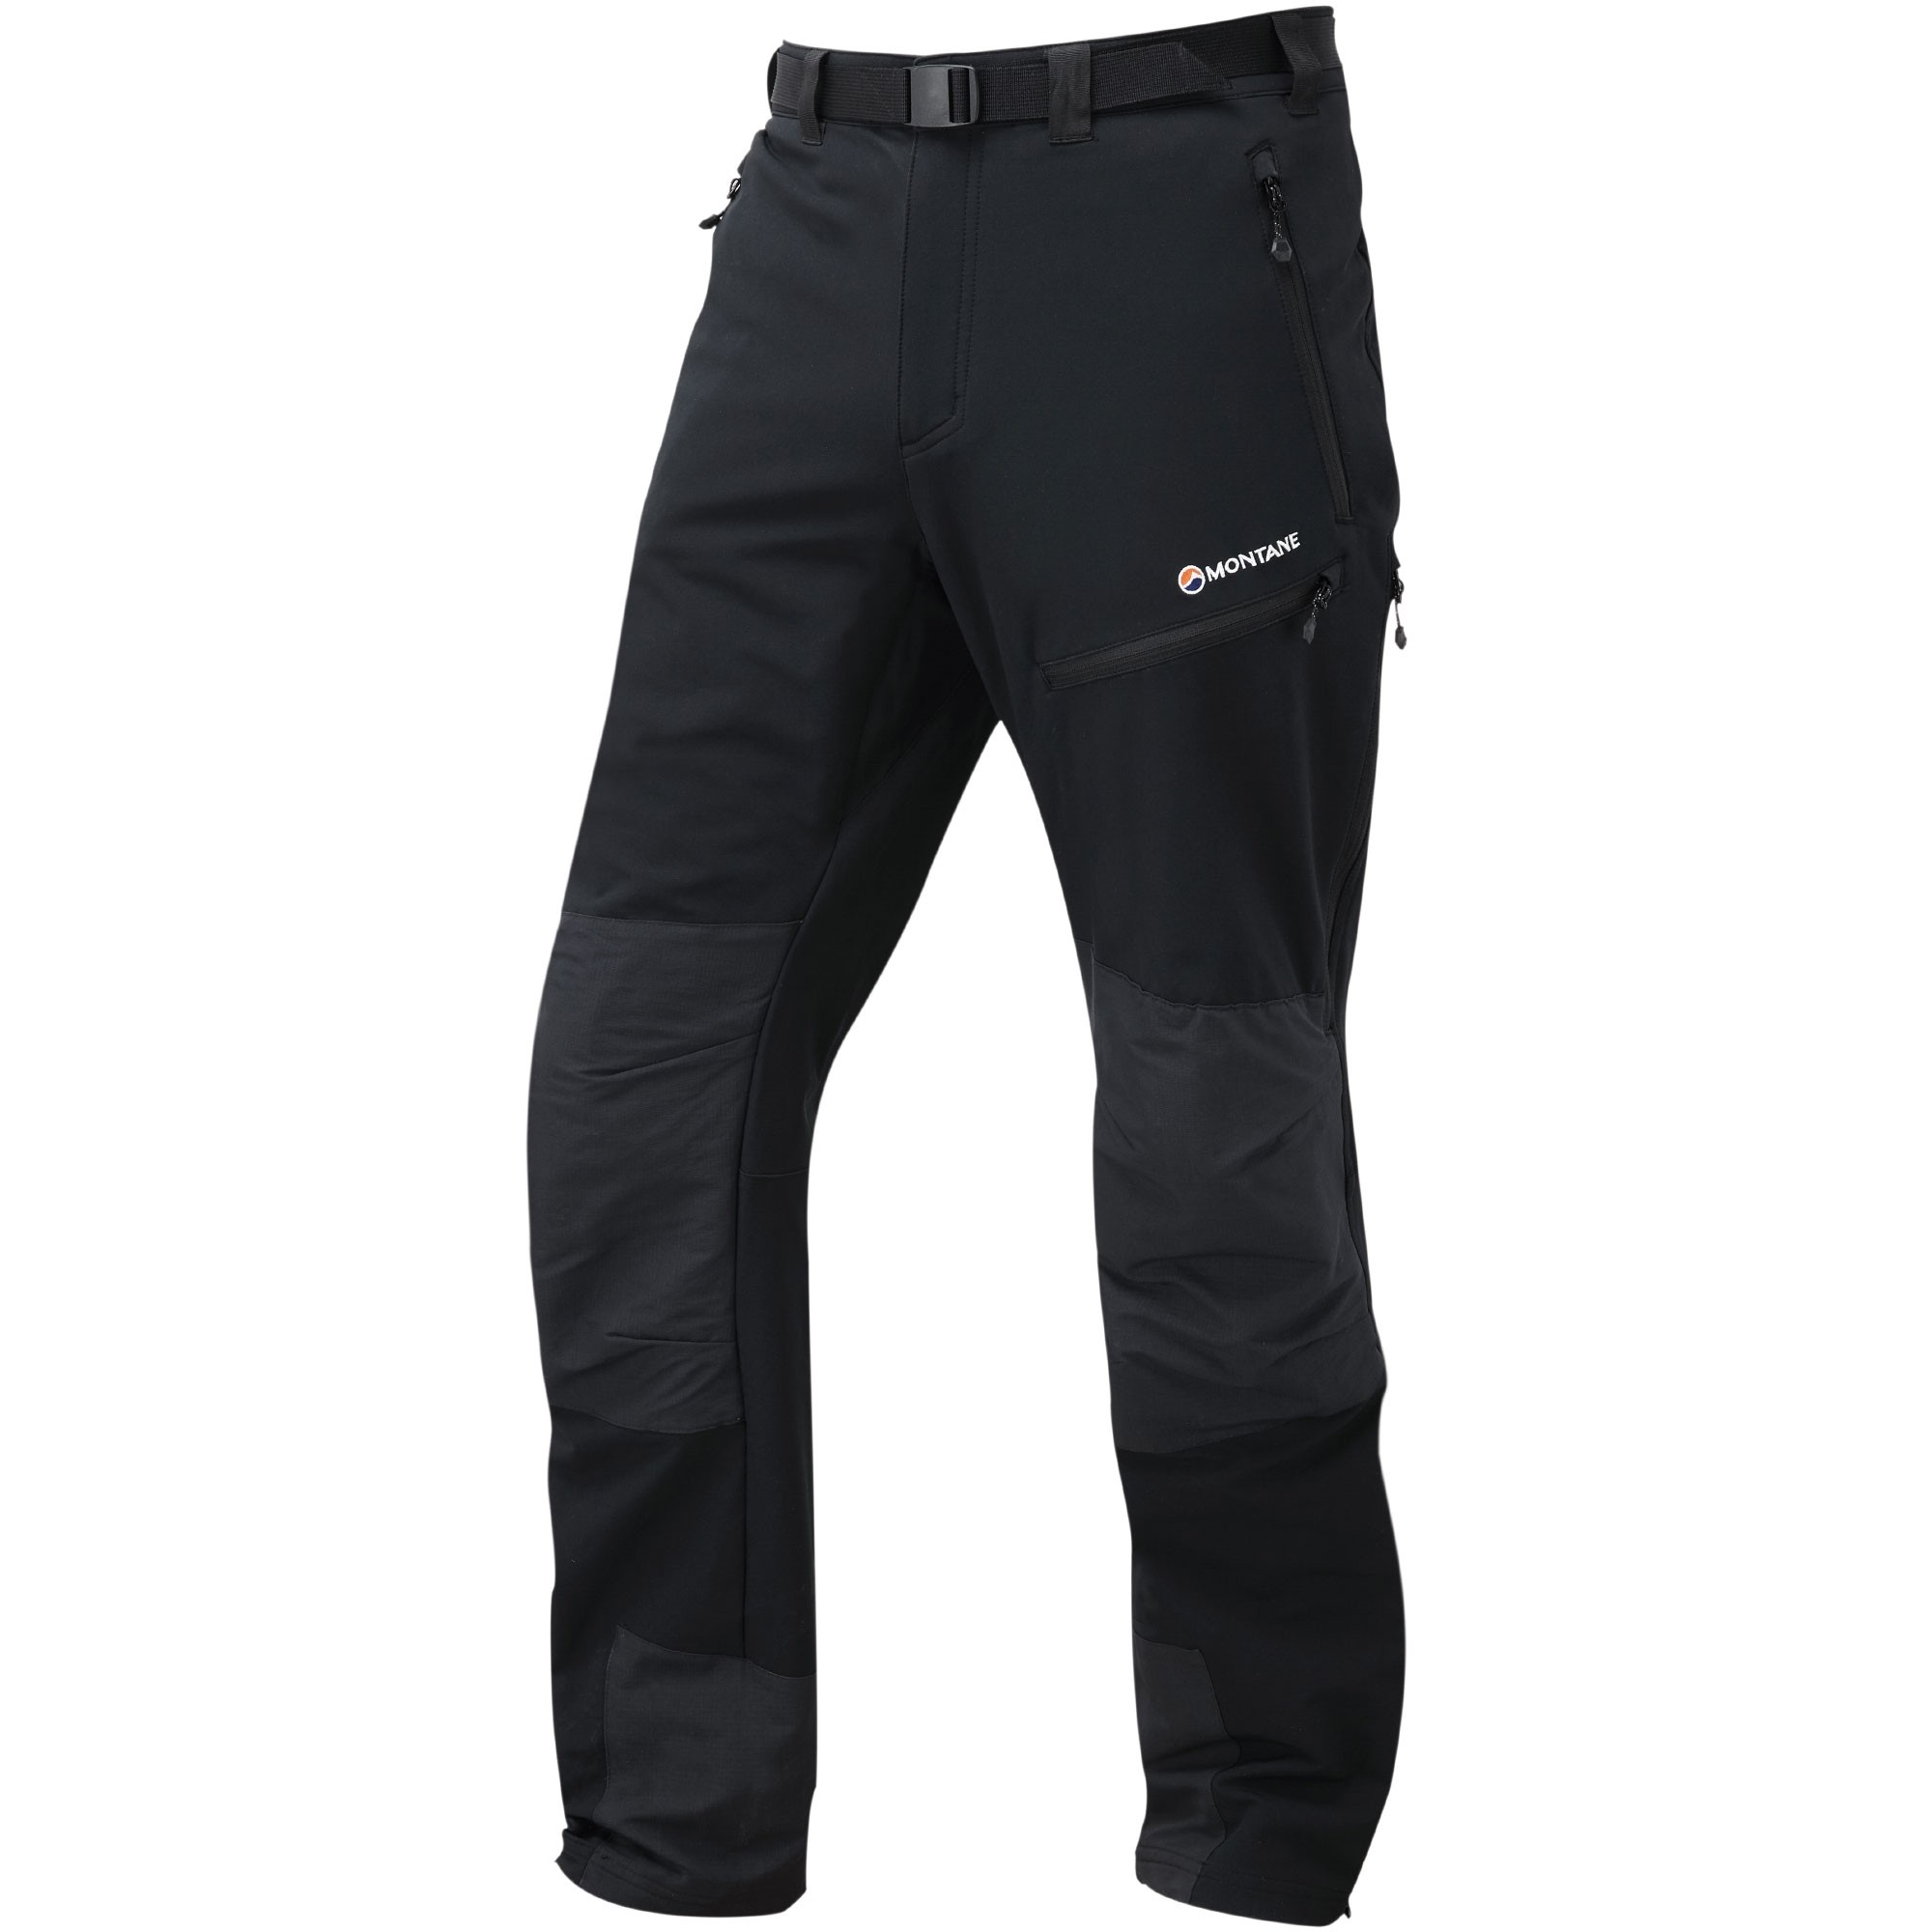 Montane Terra Mission Men's Mountaineering Pants - Black